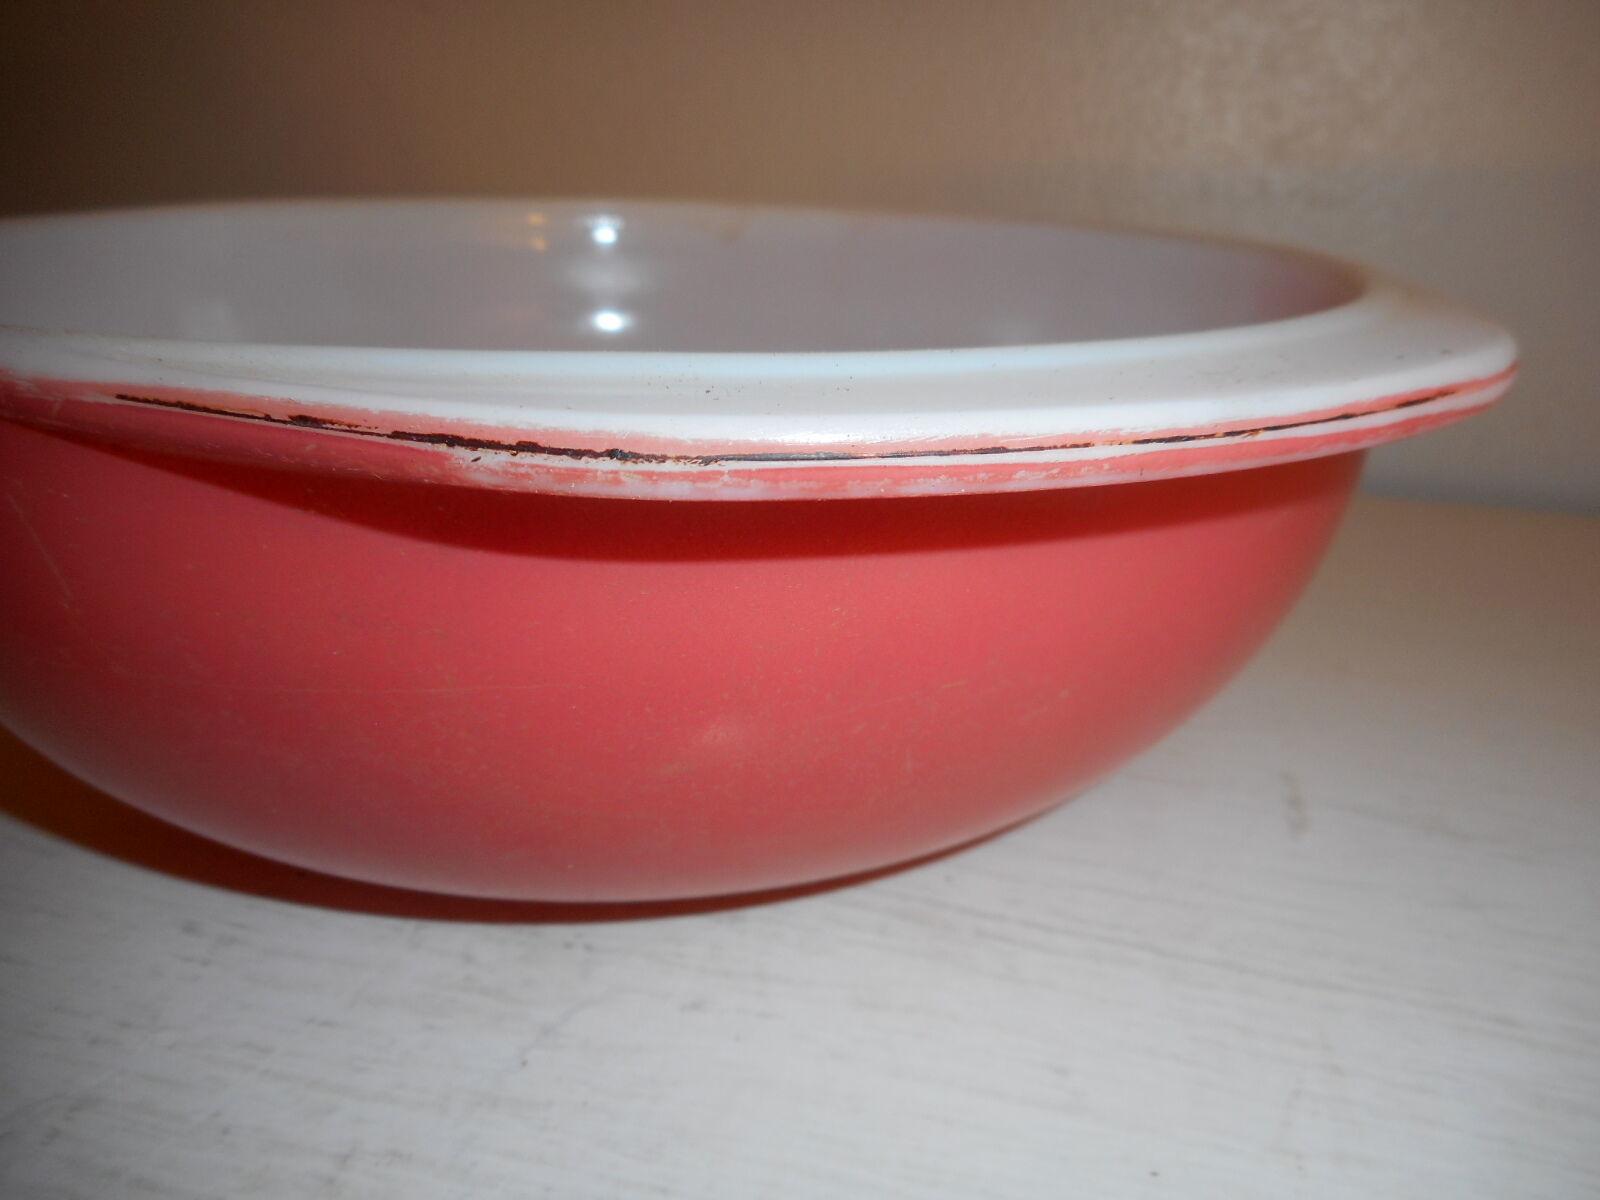 Vintage Pyrex Flamingo pink  024 2 Quart Casserole Dish well loved!